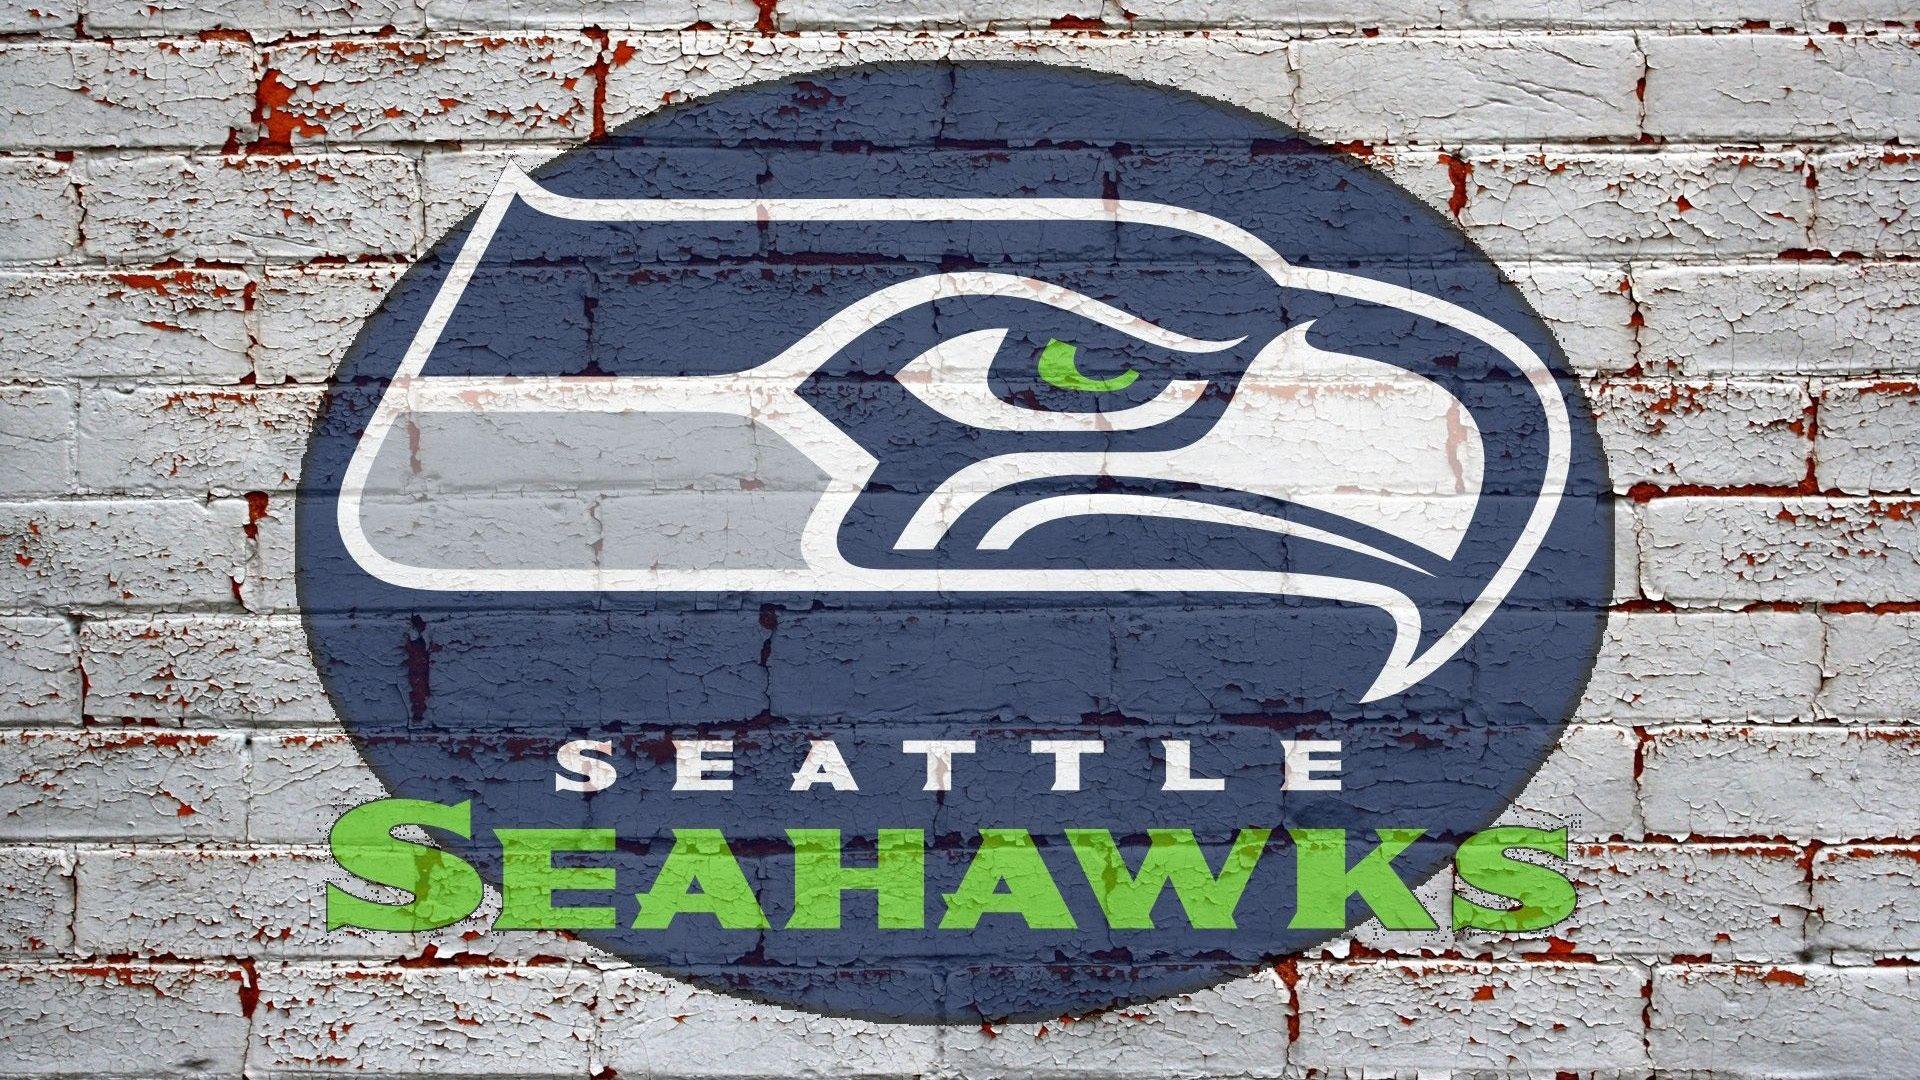 Seattle Seahawks Image